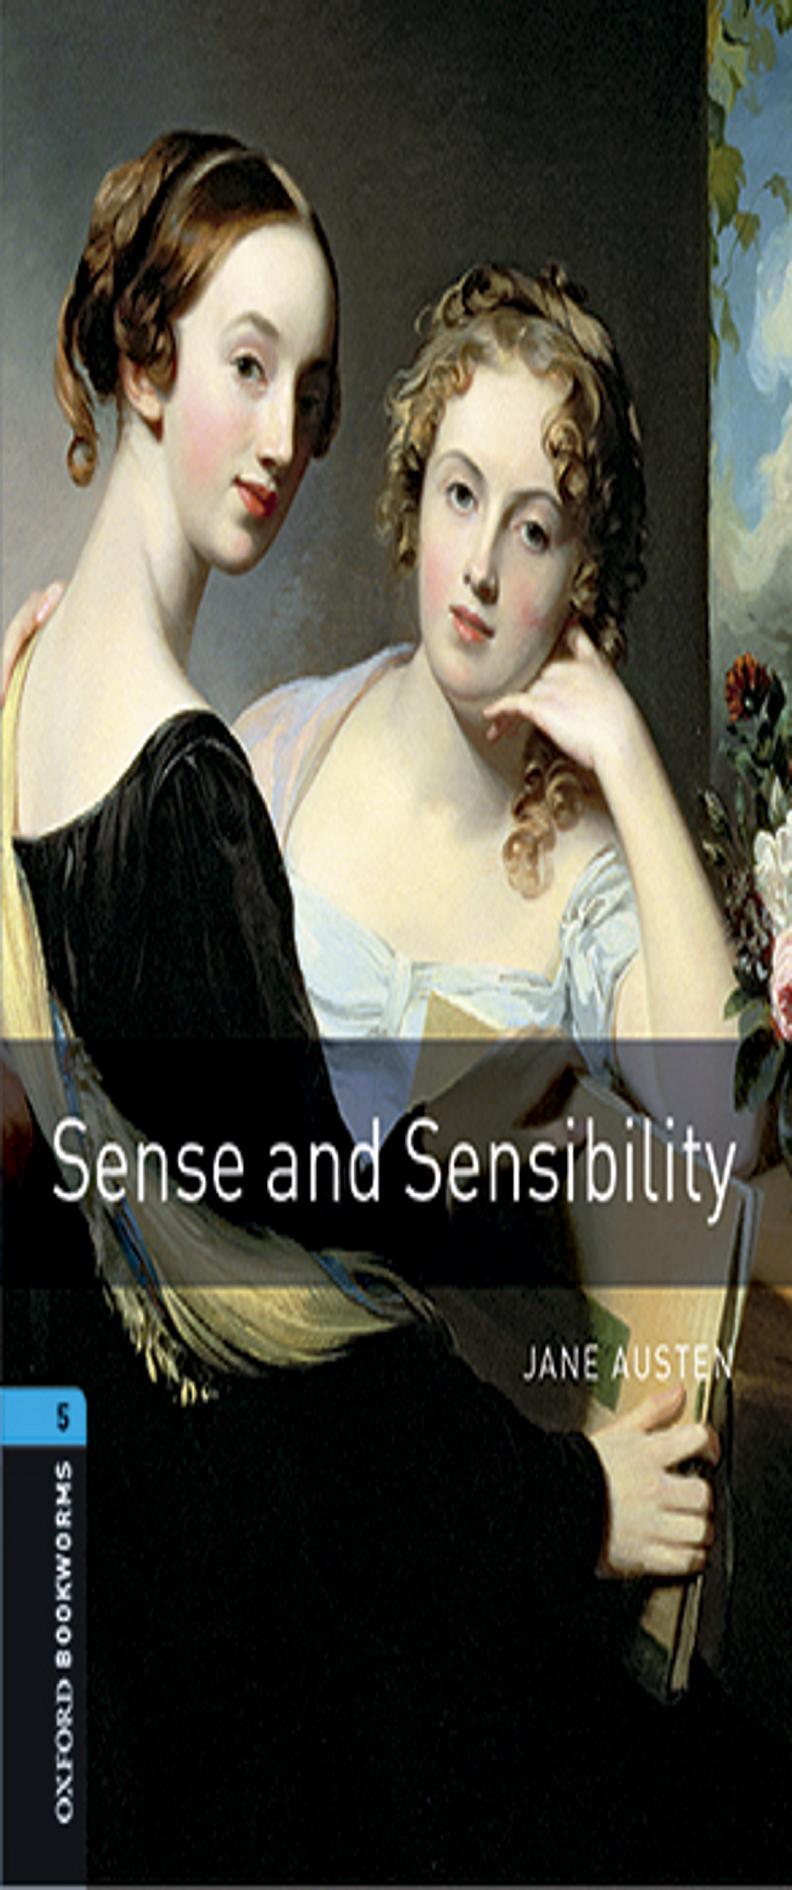 SENSE AND SENSIBILITY + MP3 - OBL 5